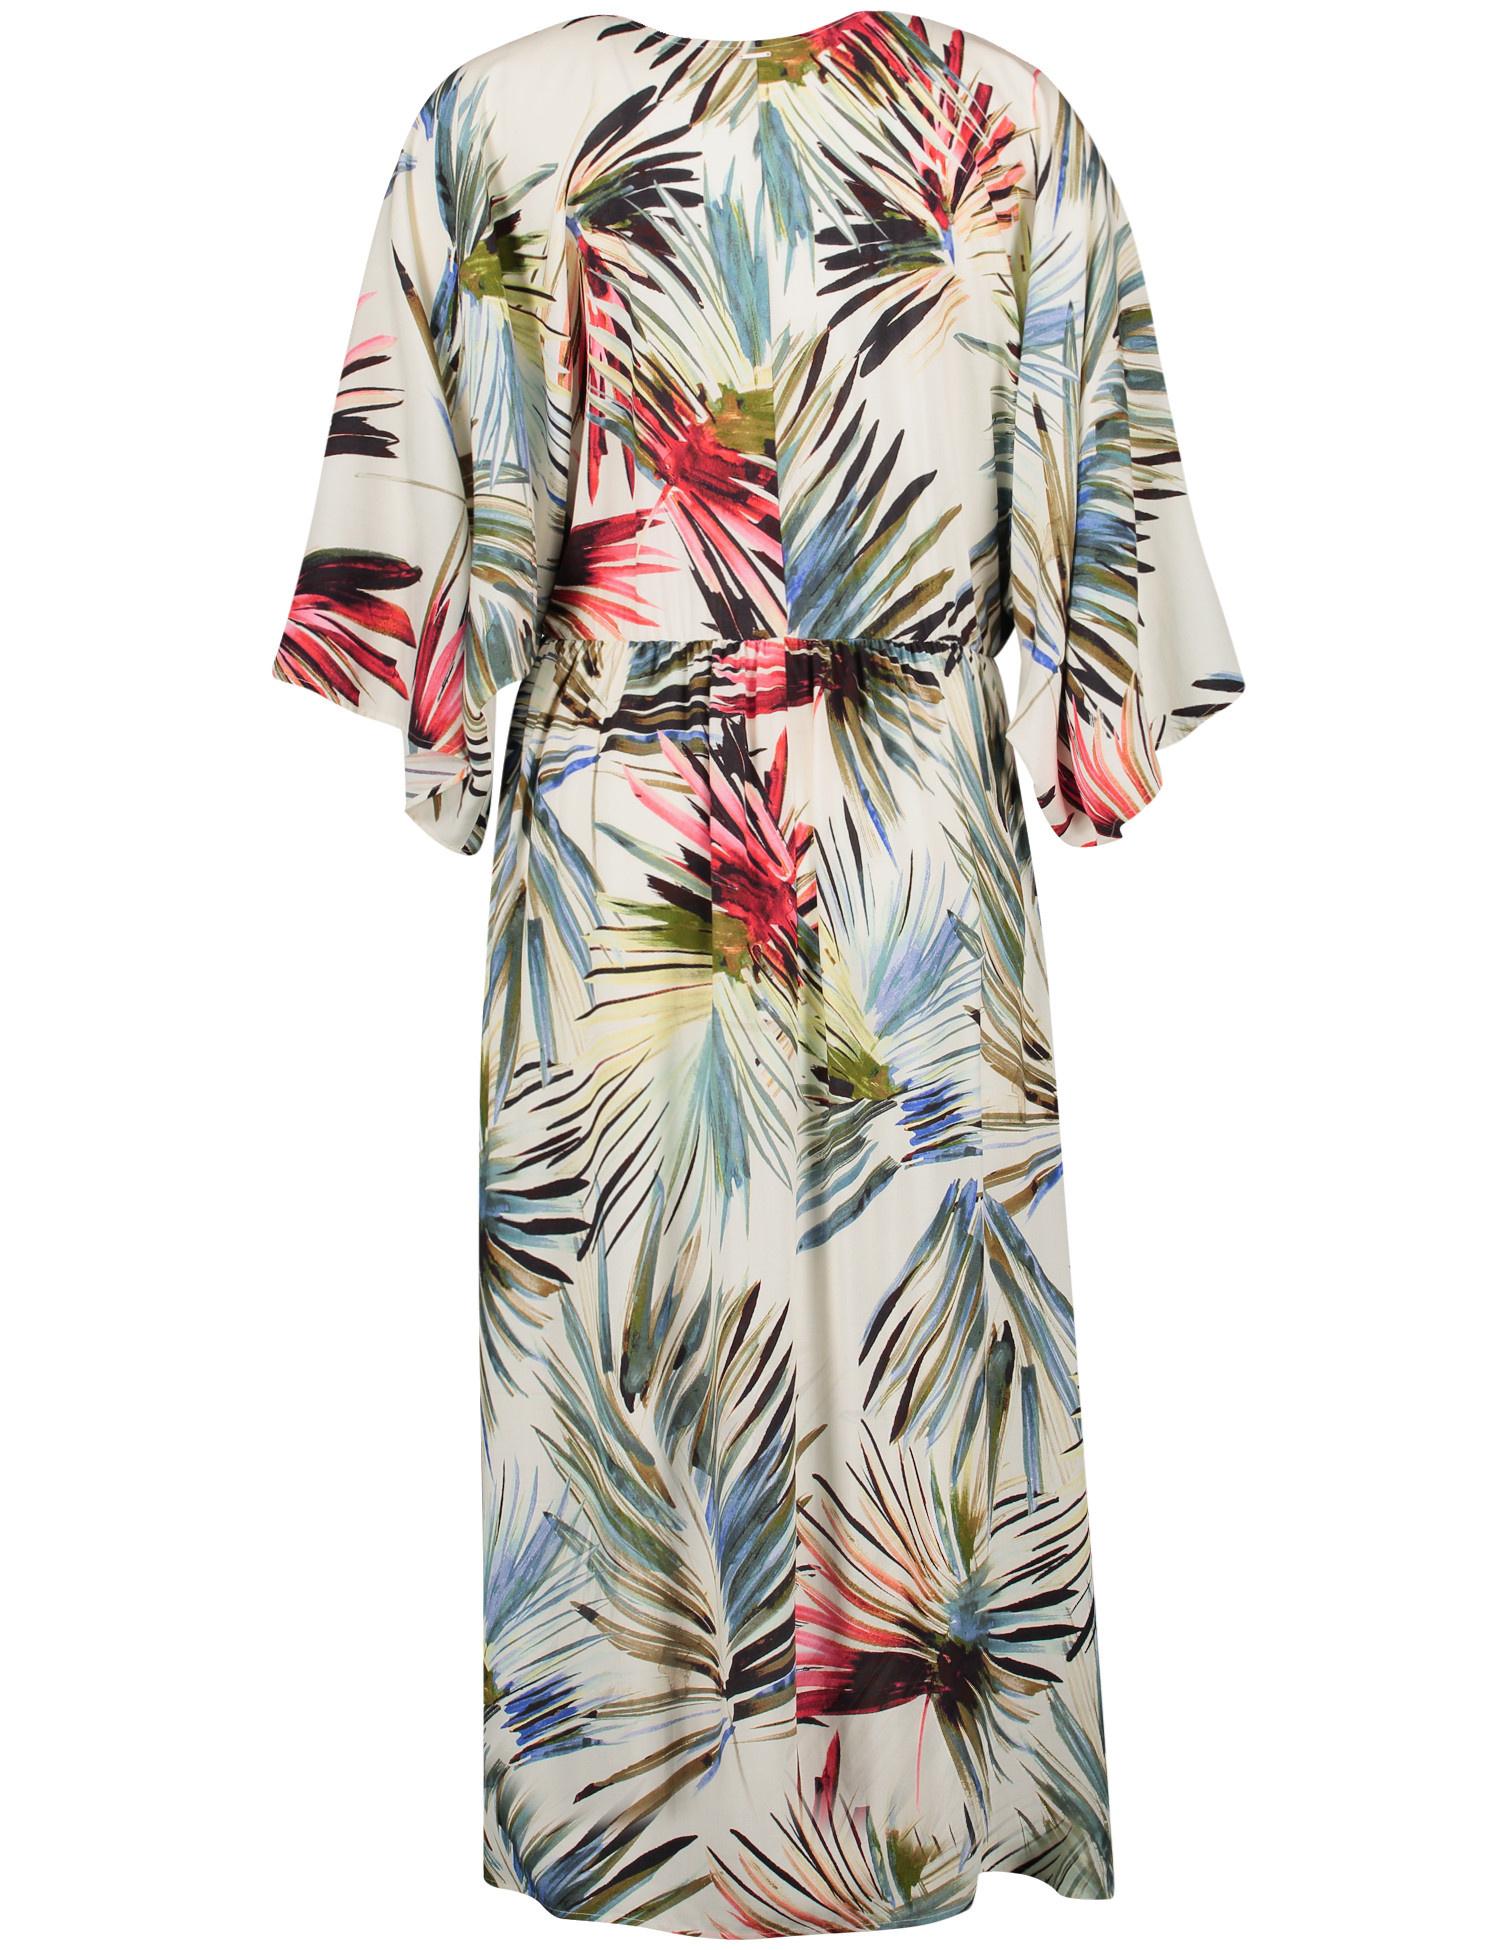 TAIFUN robe longue imprimé-4